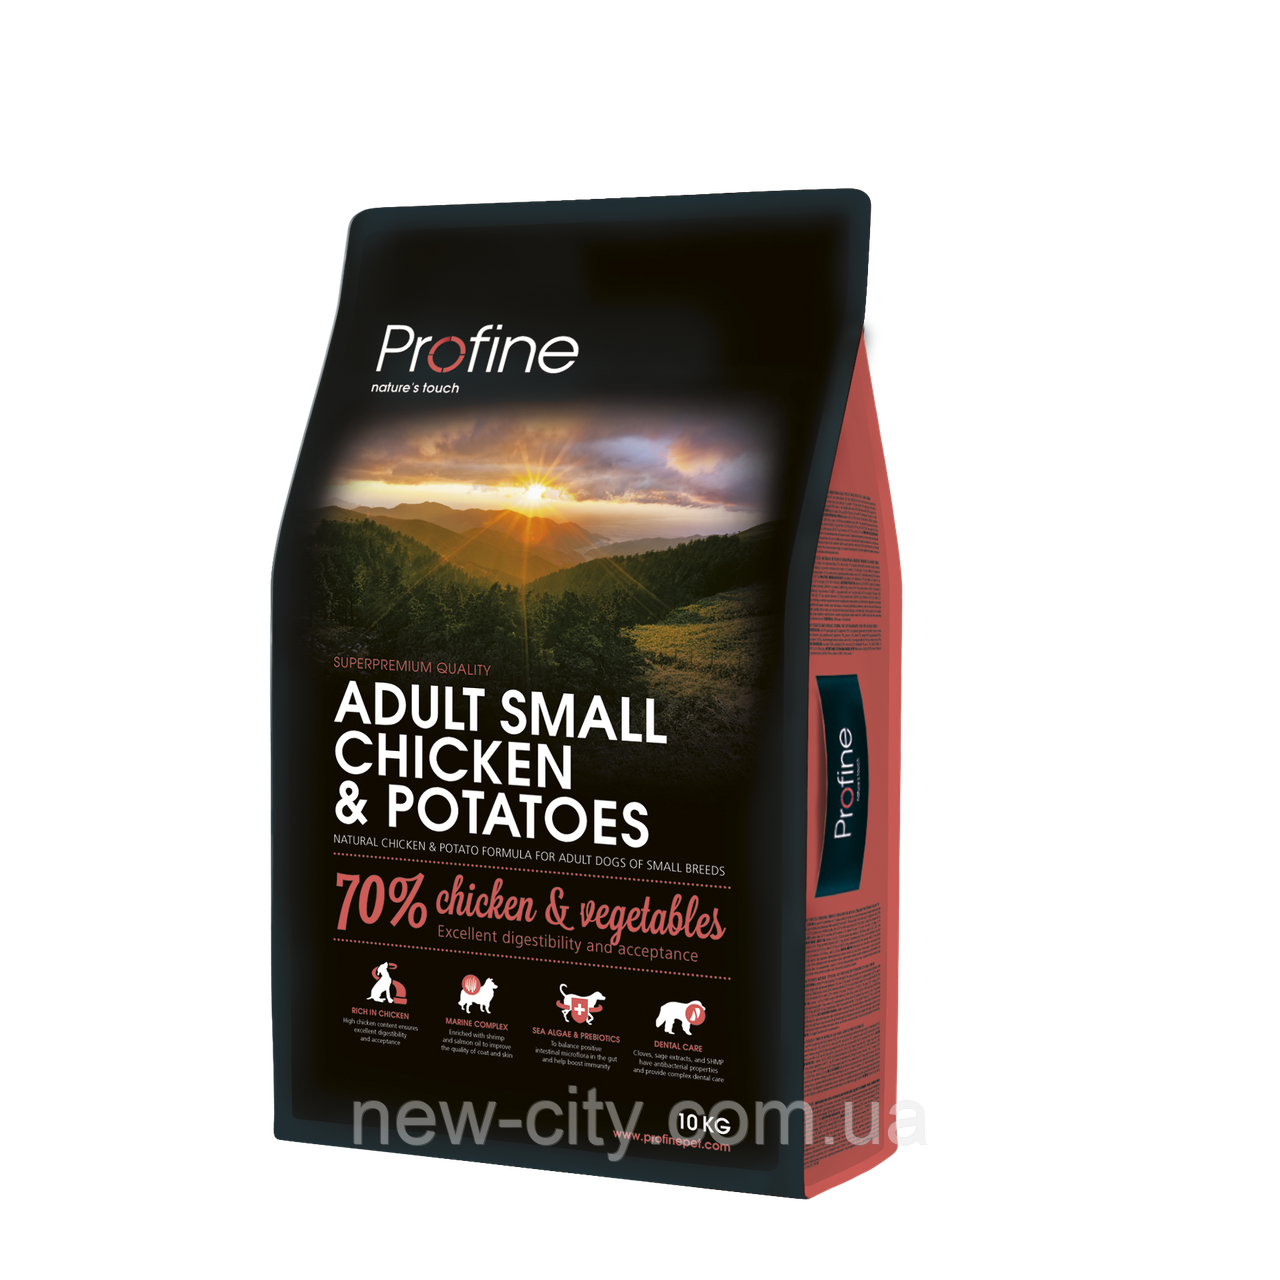 Profine Adult Small CHICKEN & POTATOES 10kg Корм для взрослых собак малых пород